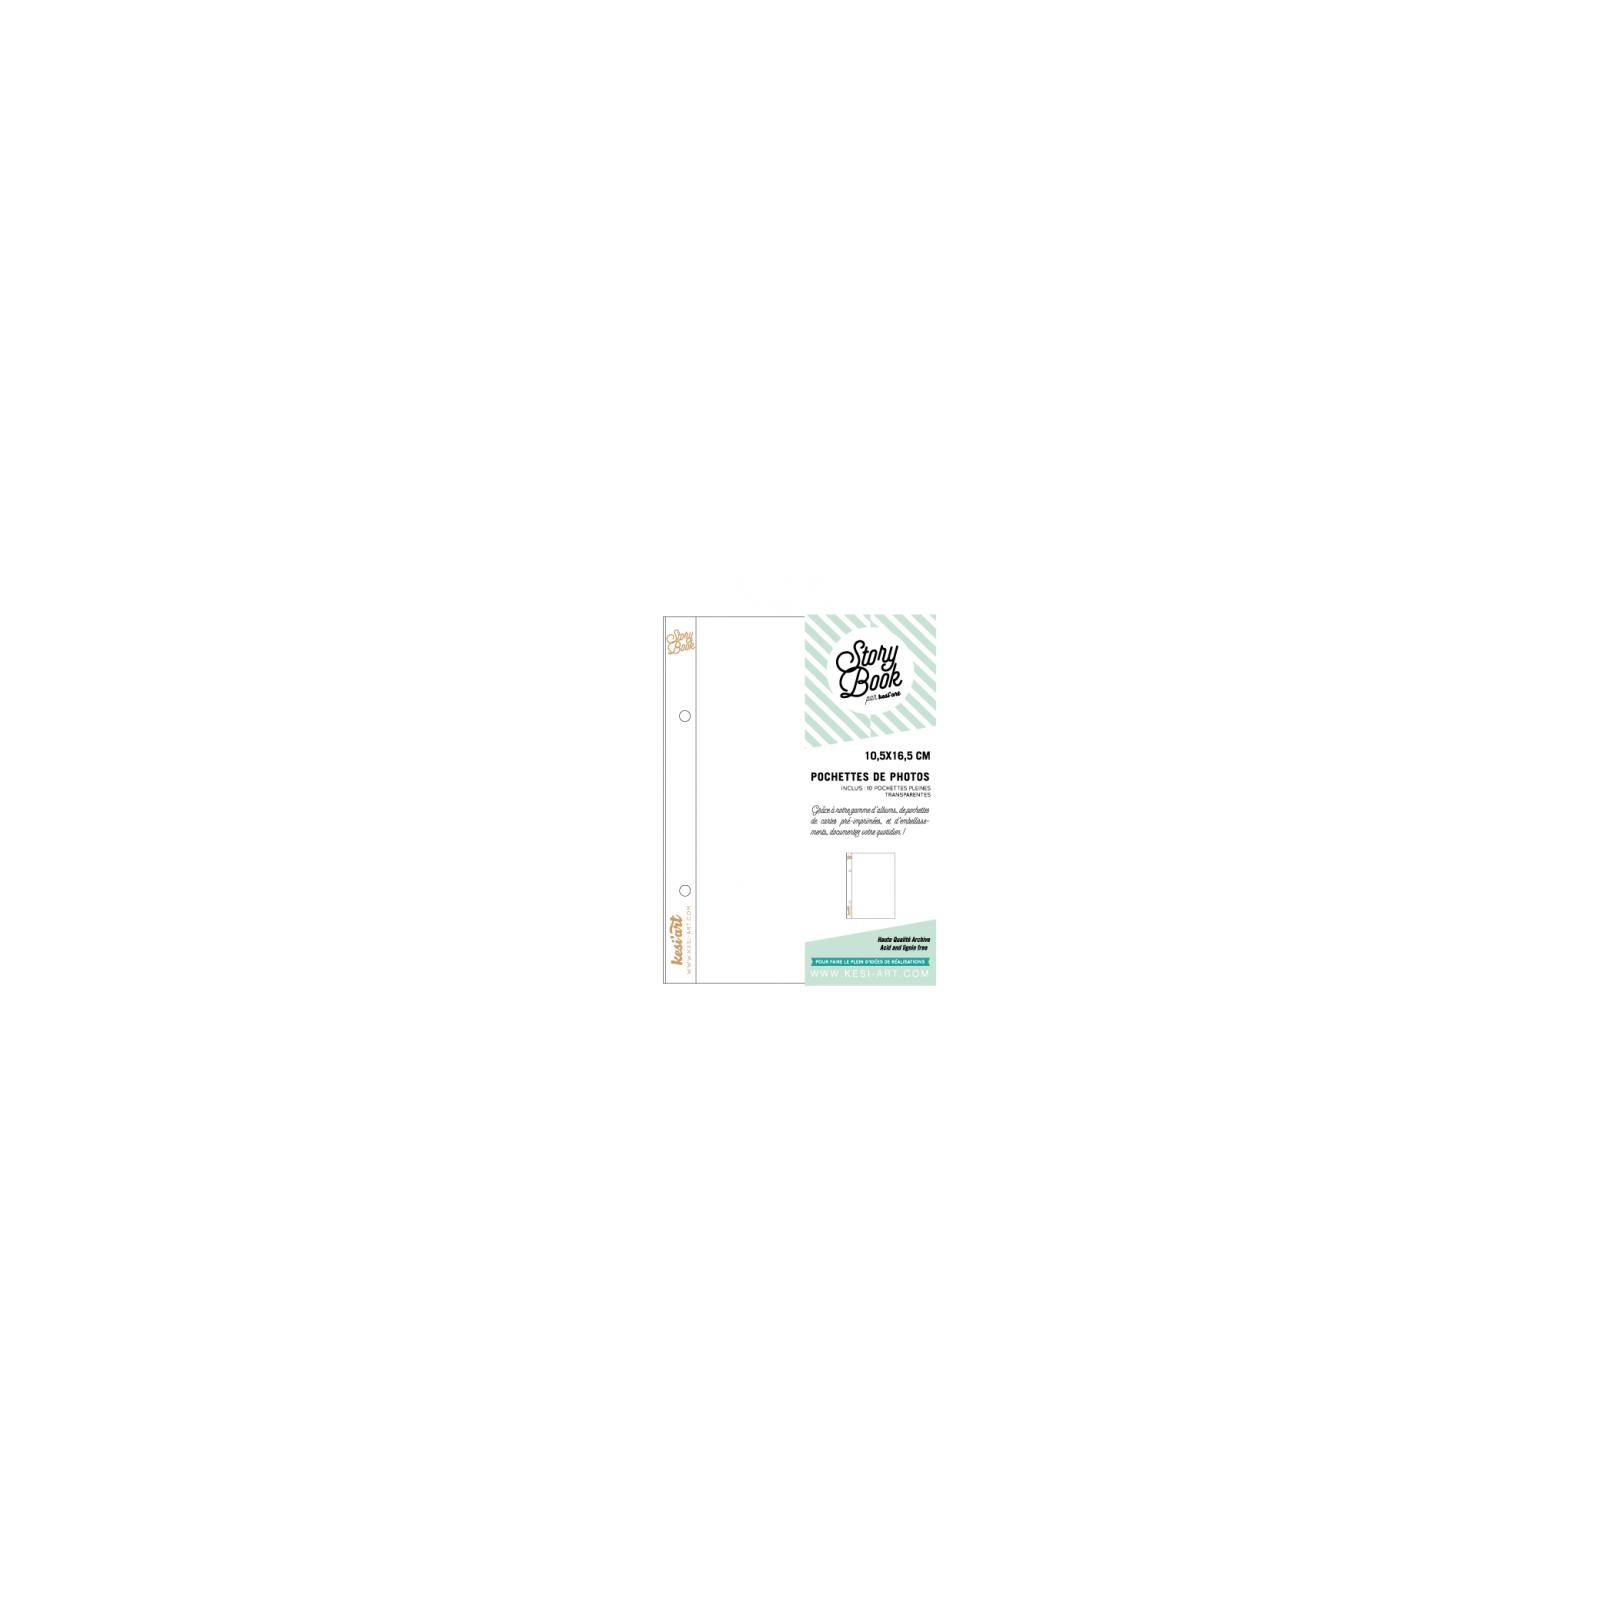 Pochettes Story Book 15x20 cm -1 compartiments 10,5 x 16,5 - Kesi'art